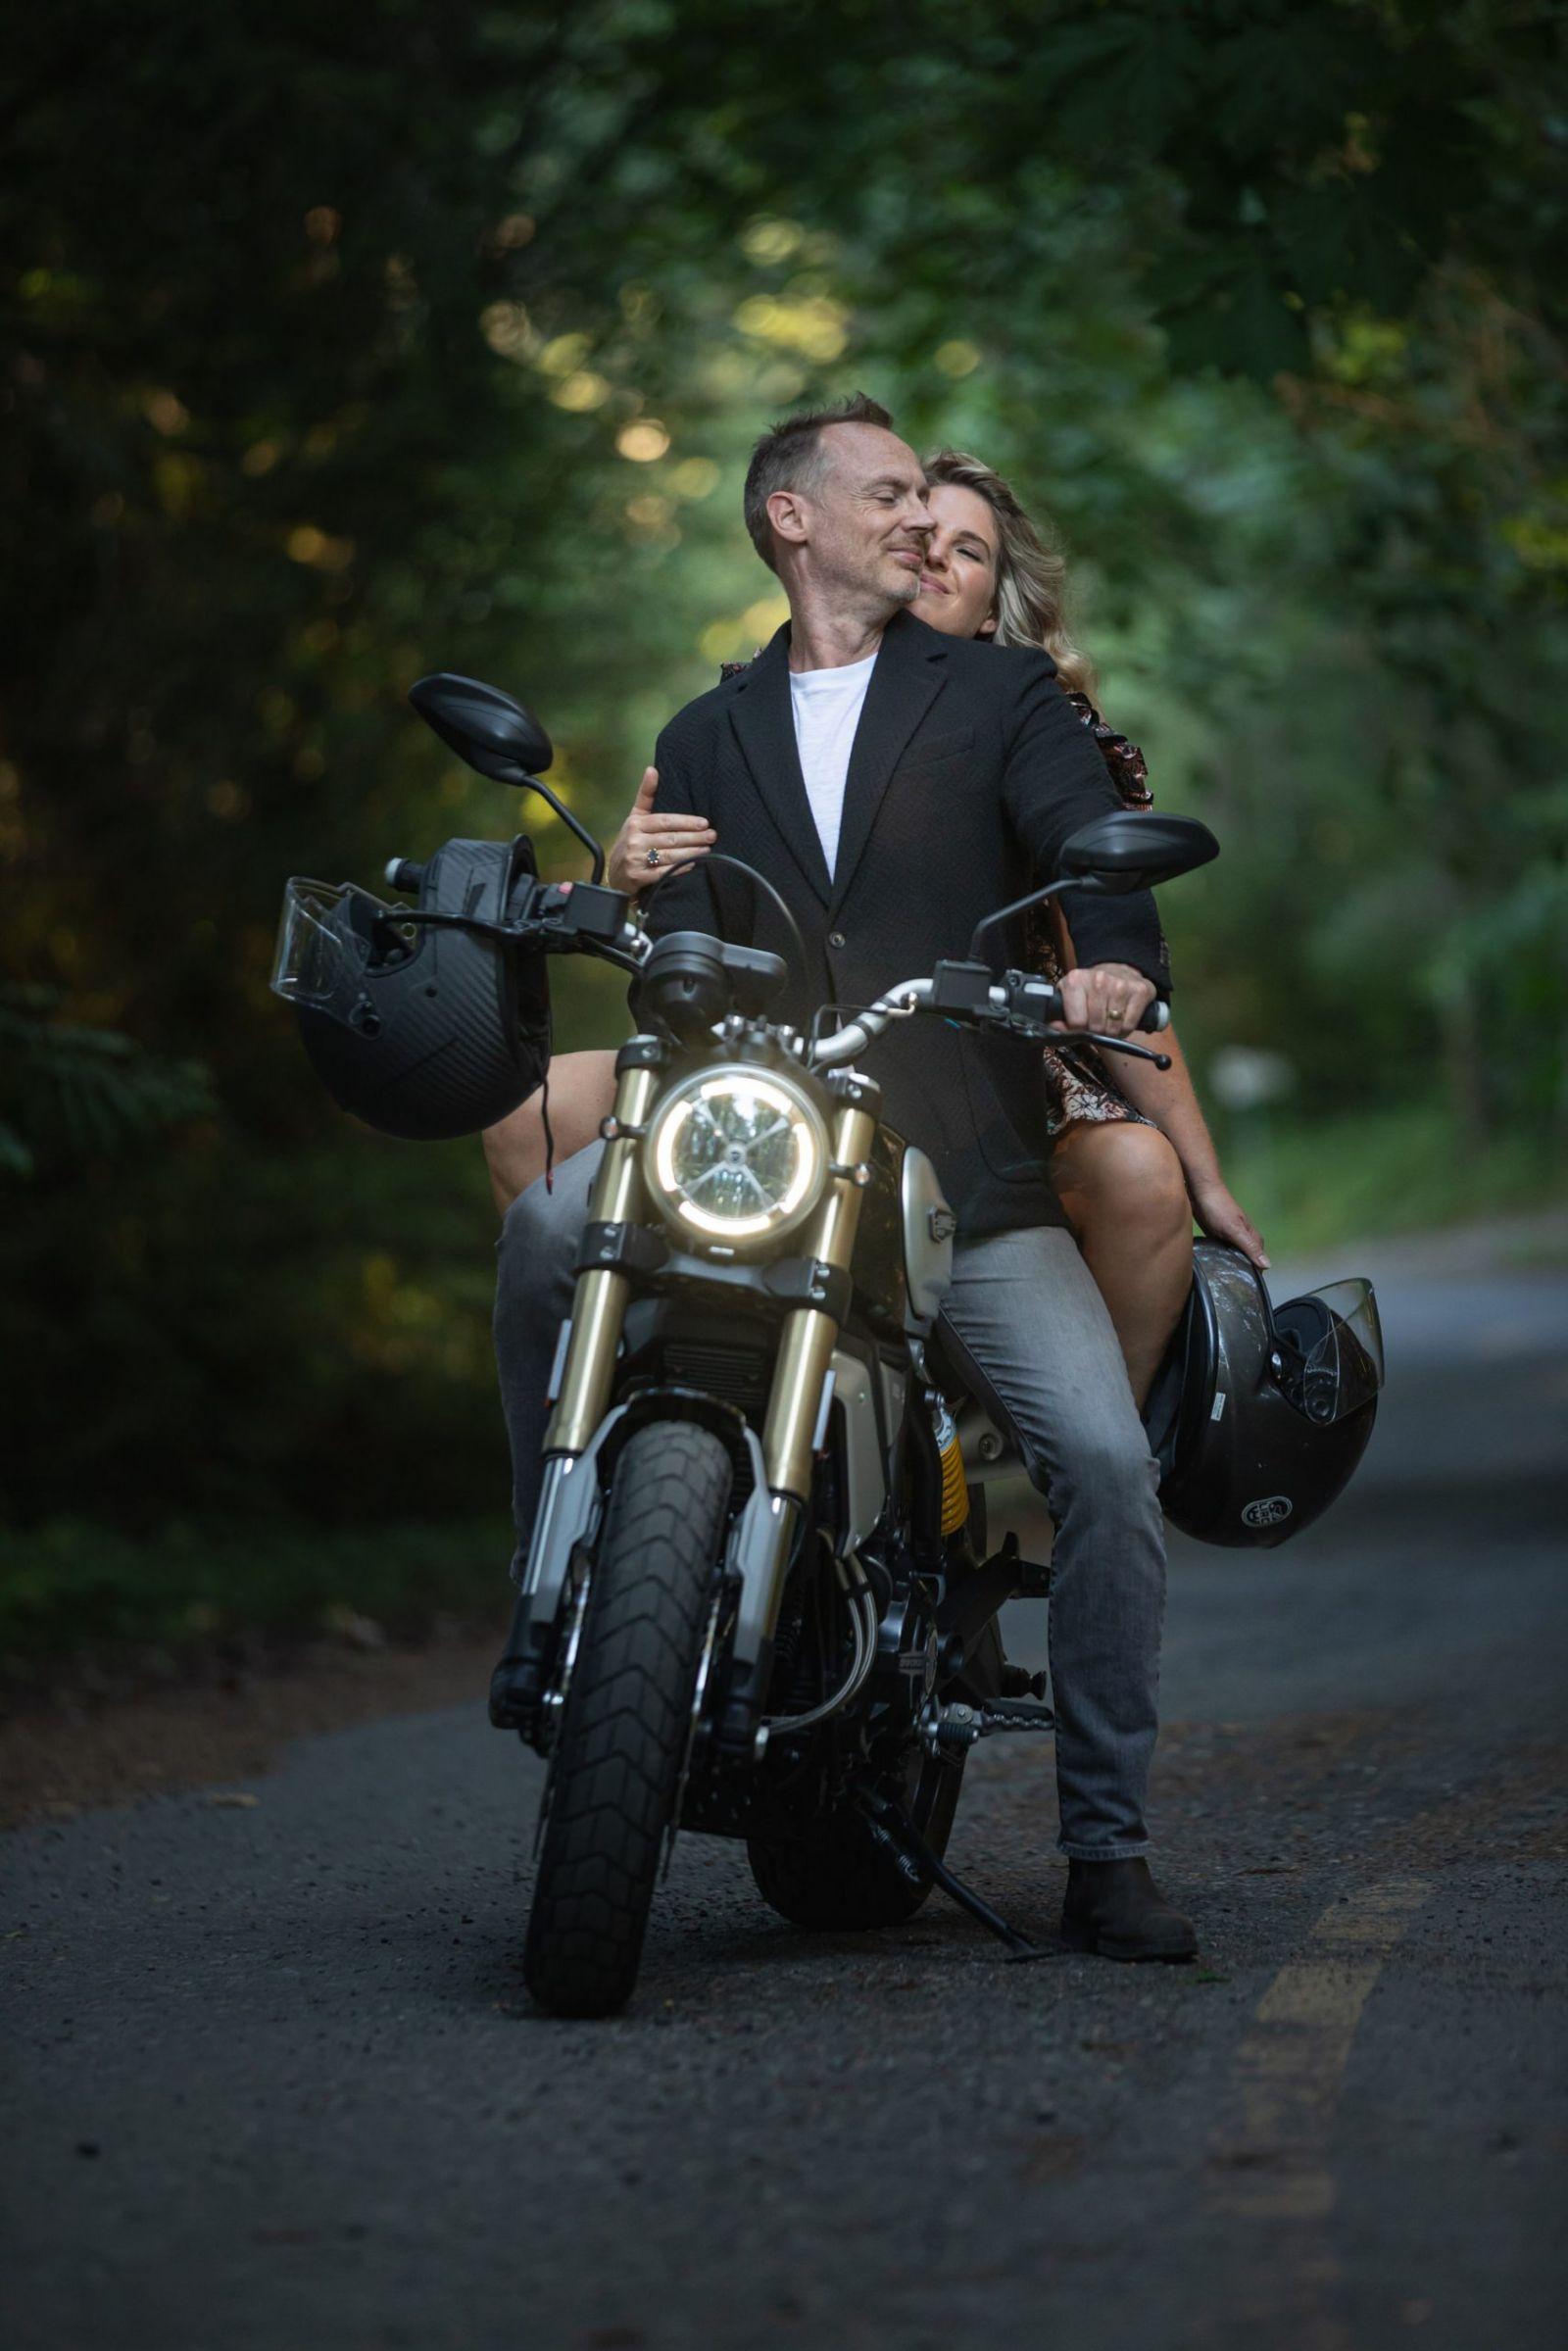 Motorcycle Couple Photos